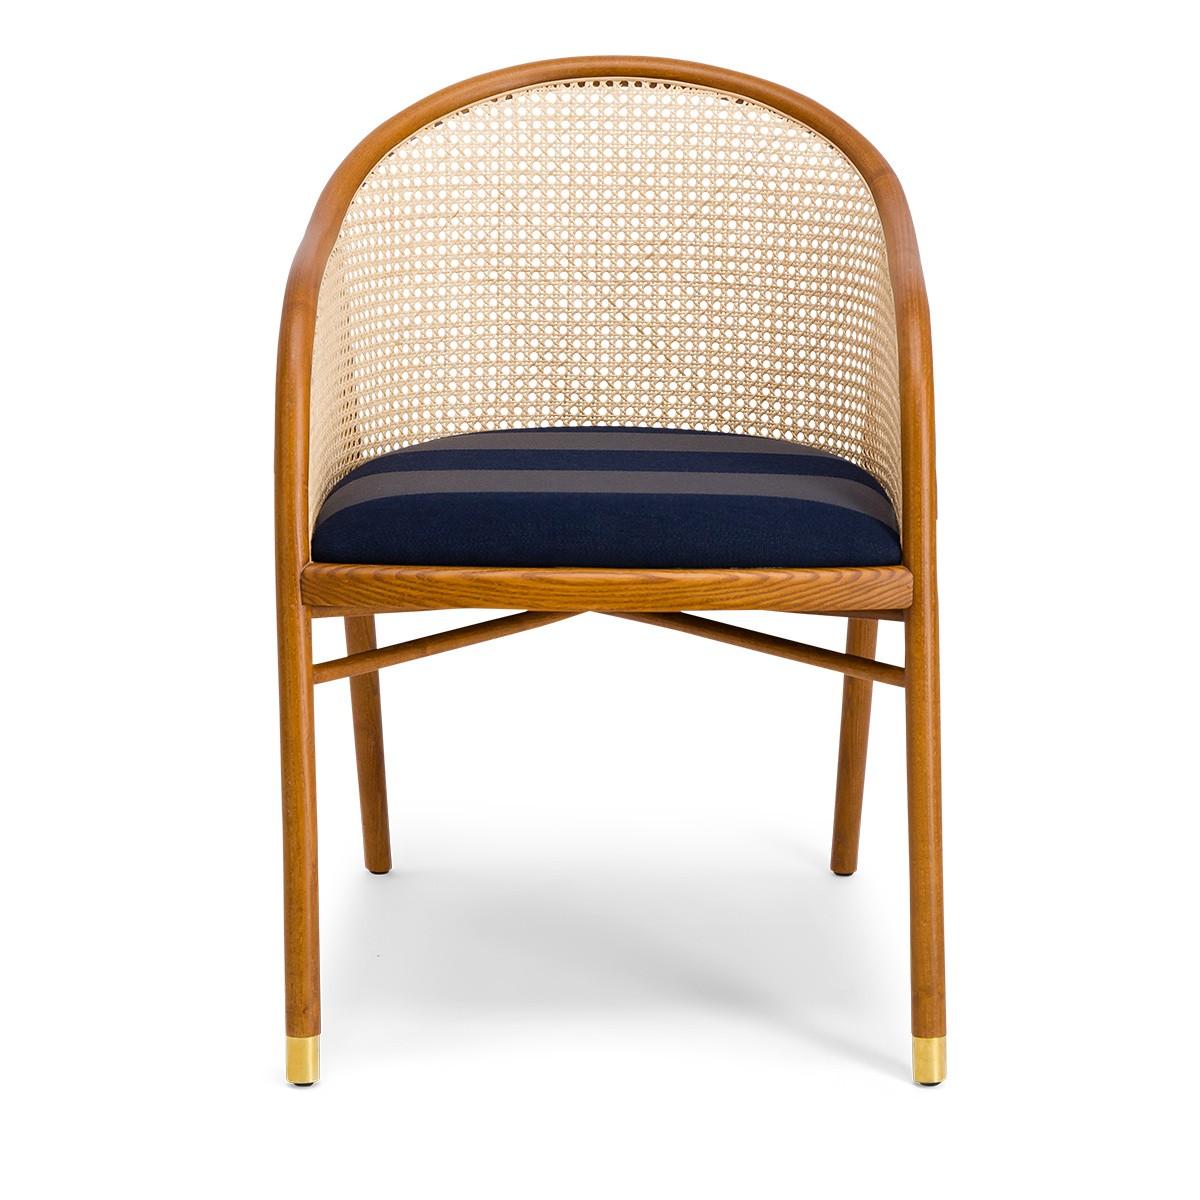 Cavallo Armchair, Kvadrat / Raf Simons Navy Blue Wool with Cherrywood Frame - Limited Edition